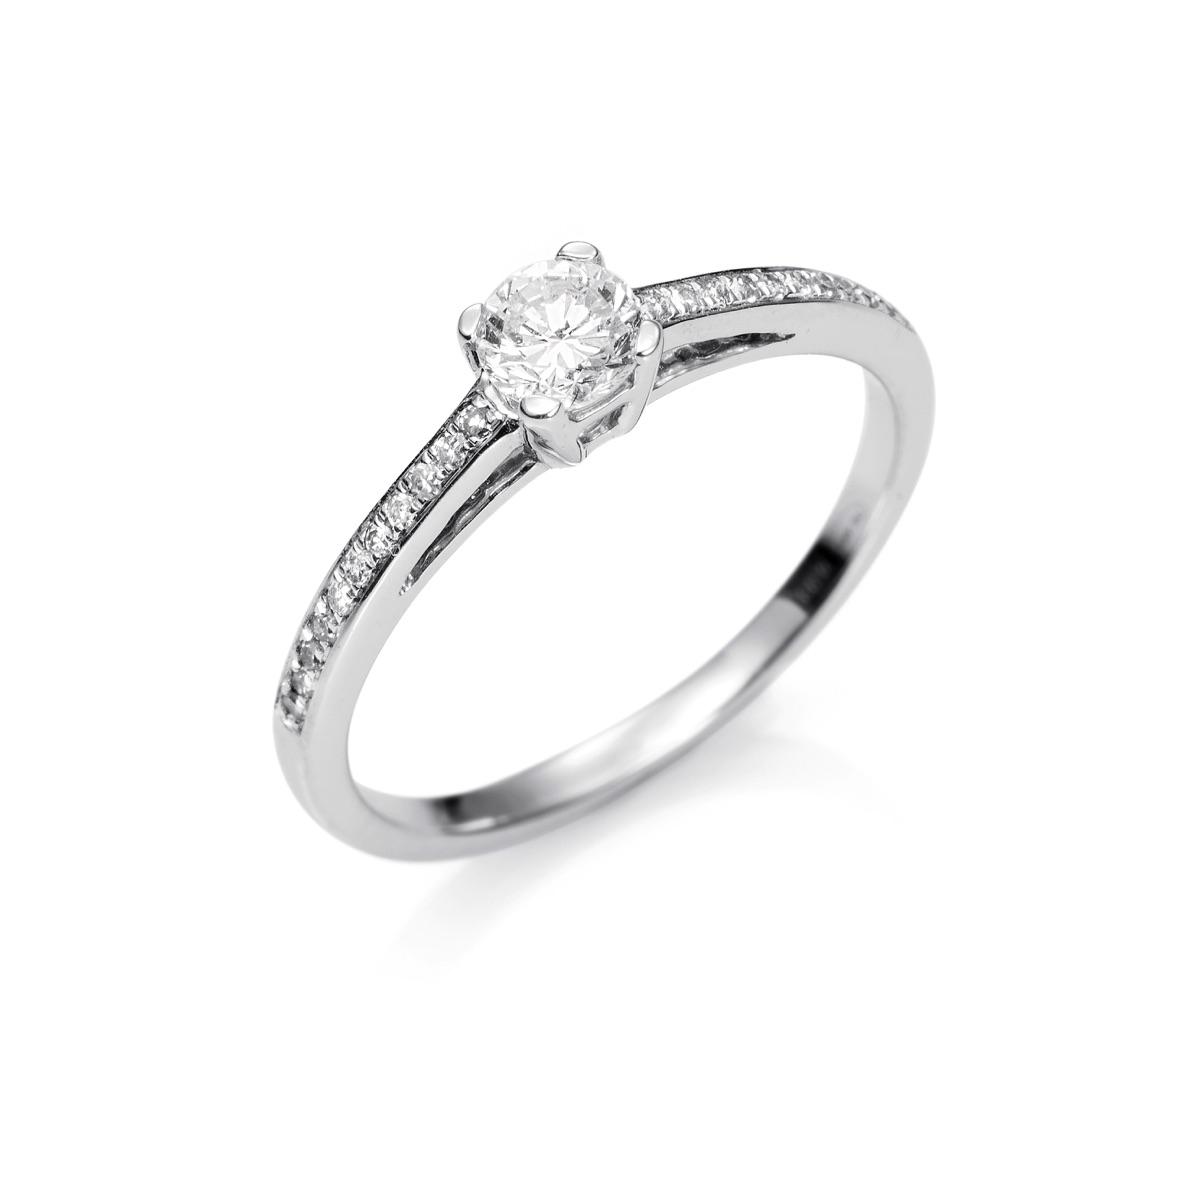 50773ac9b615 Anillo de Compromiso de Oro 18kts con Diamante talla brillante de 0 ...